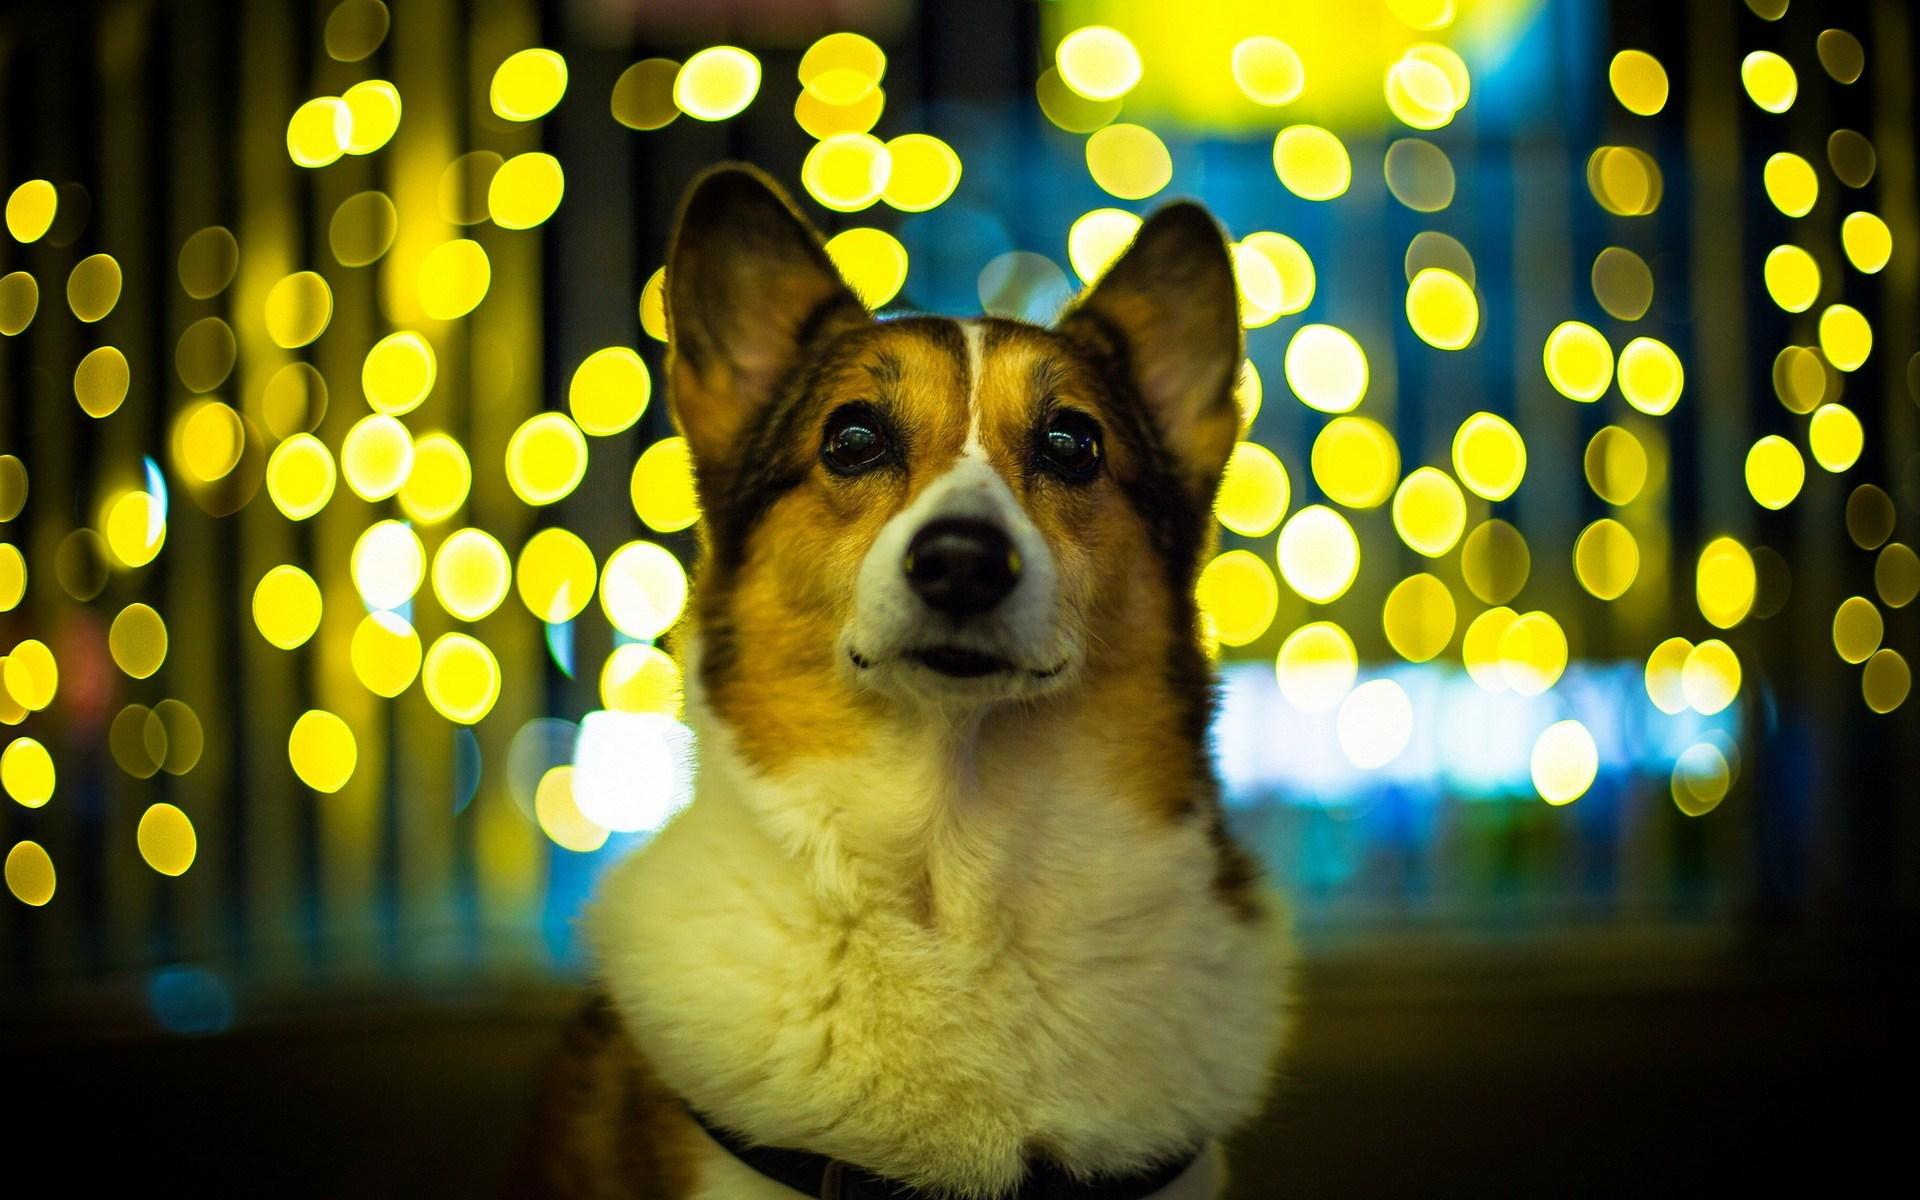 dog mood wallpaper 43349